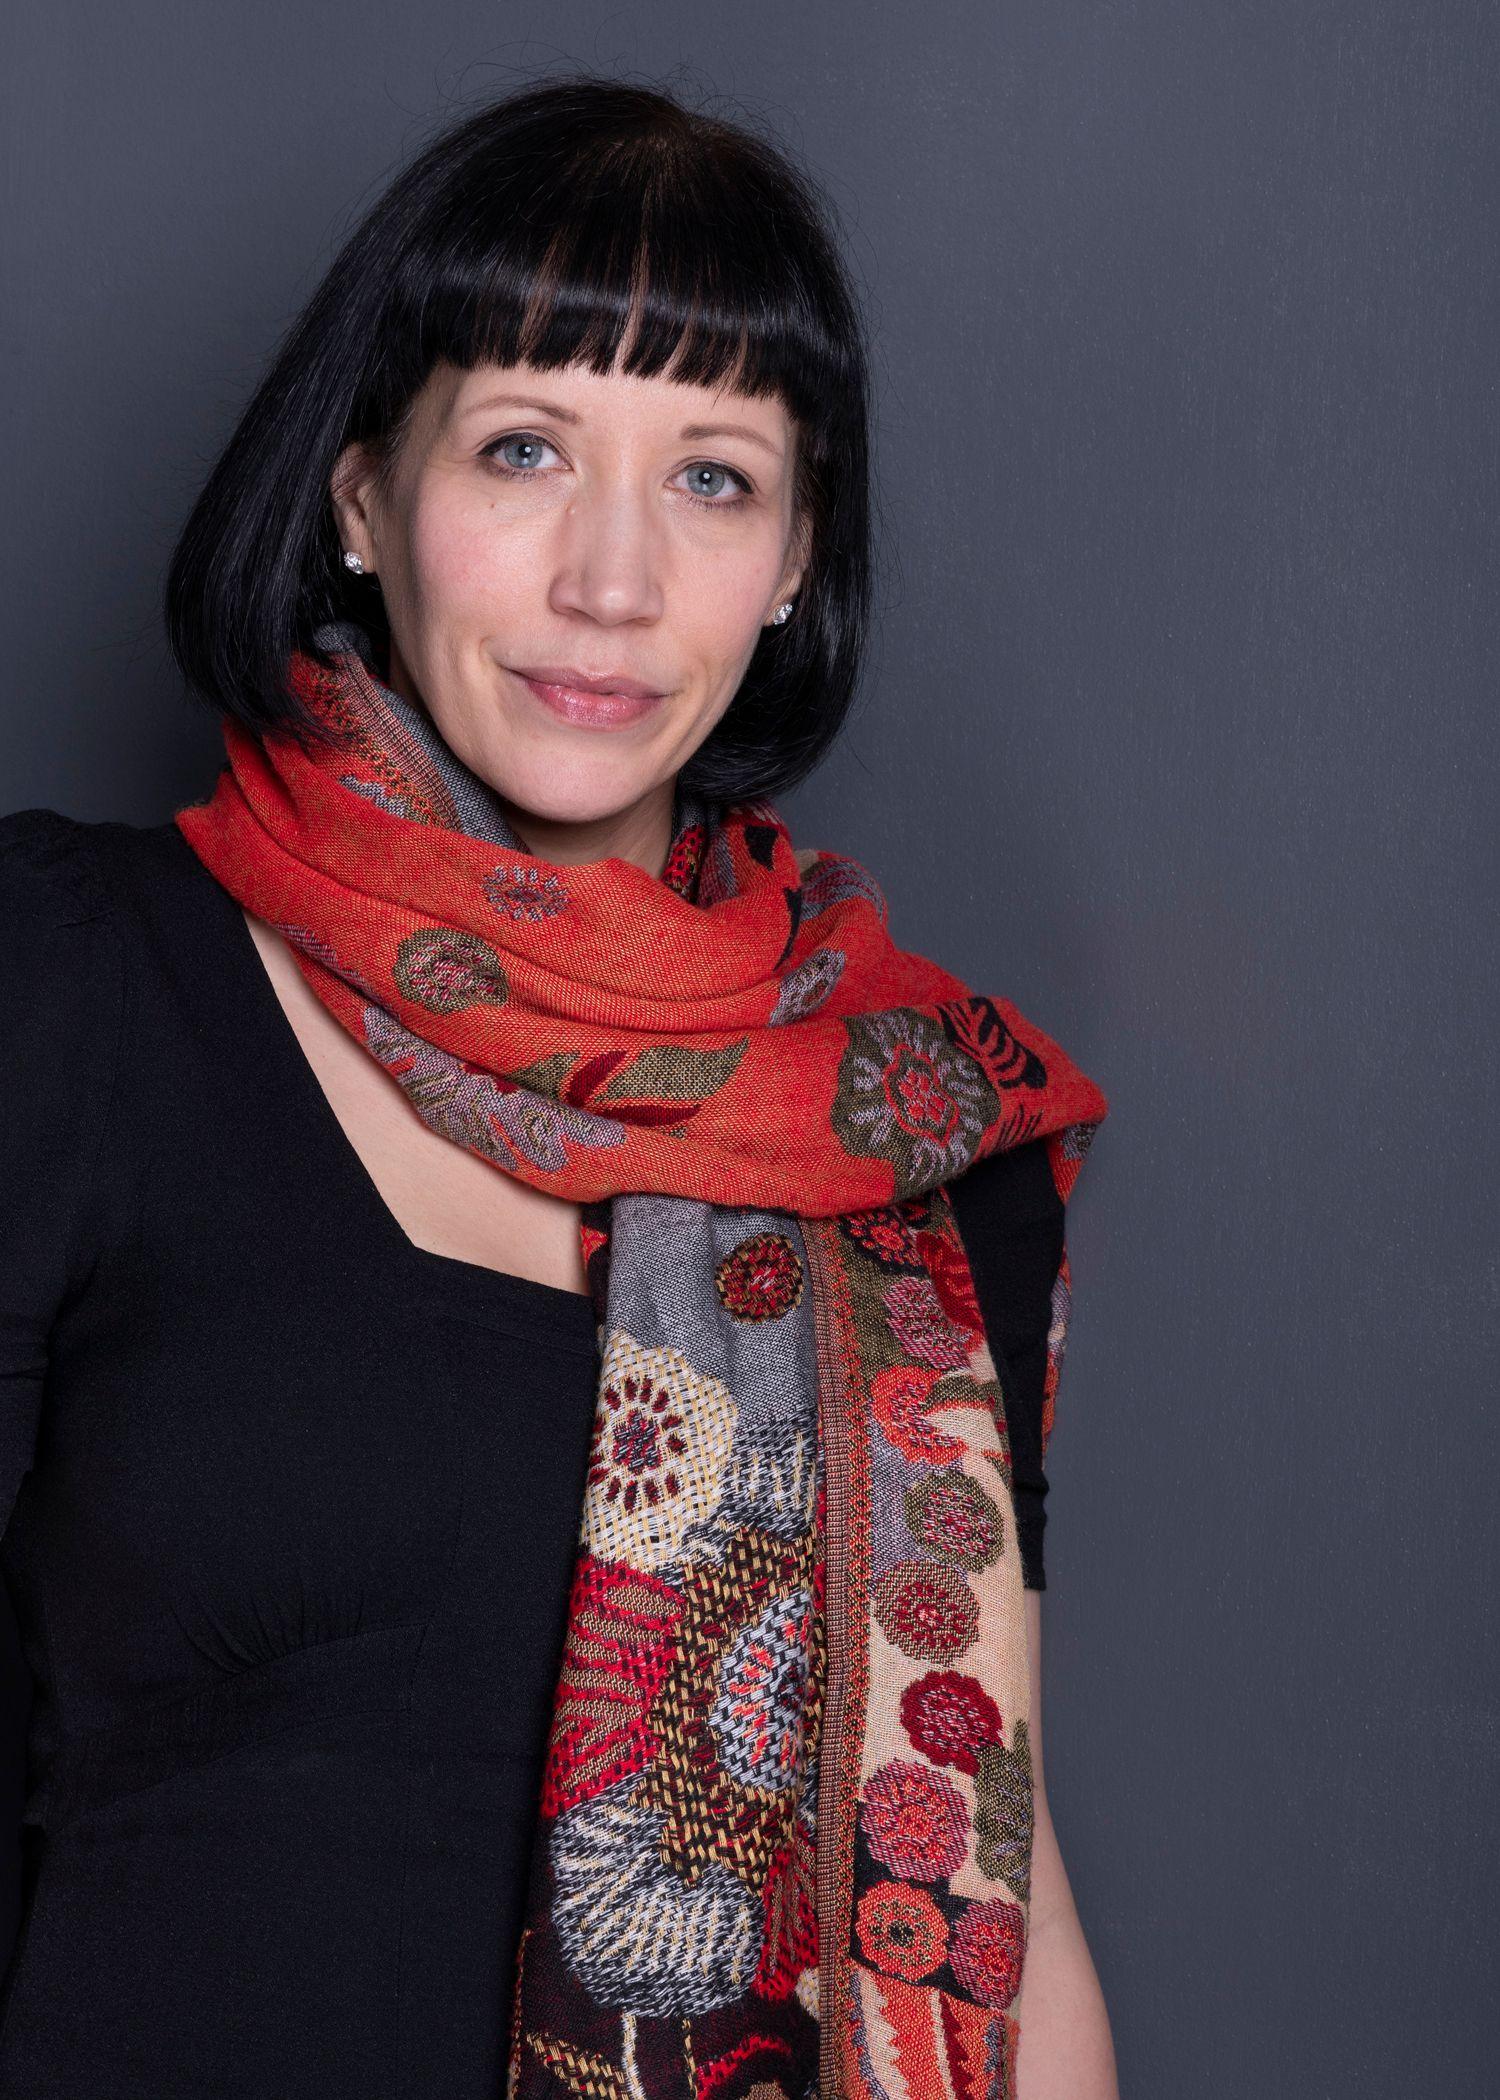 Katherine Clements